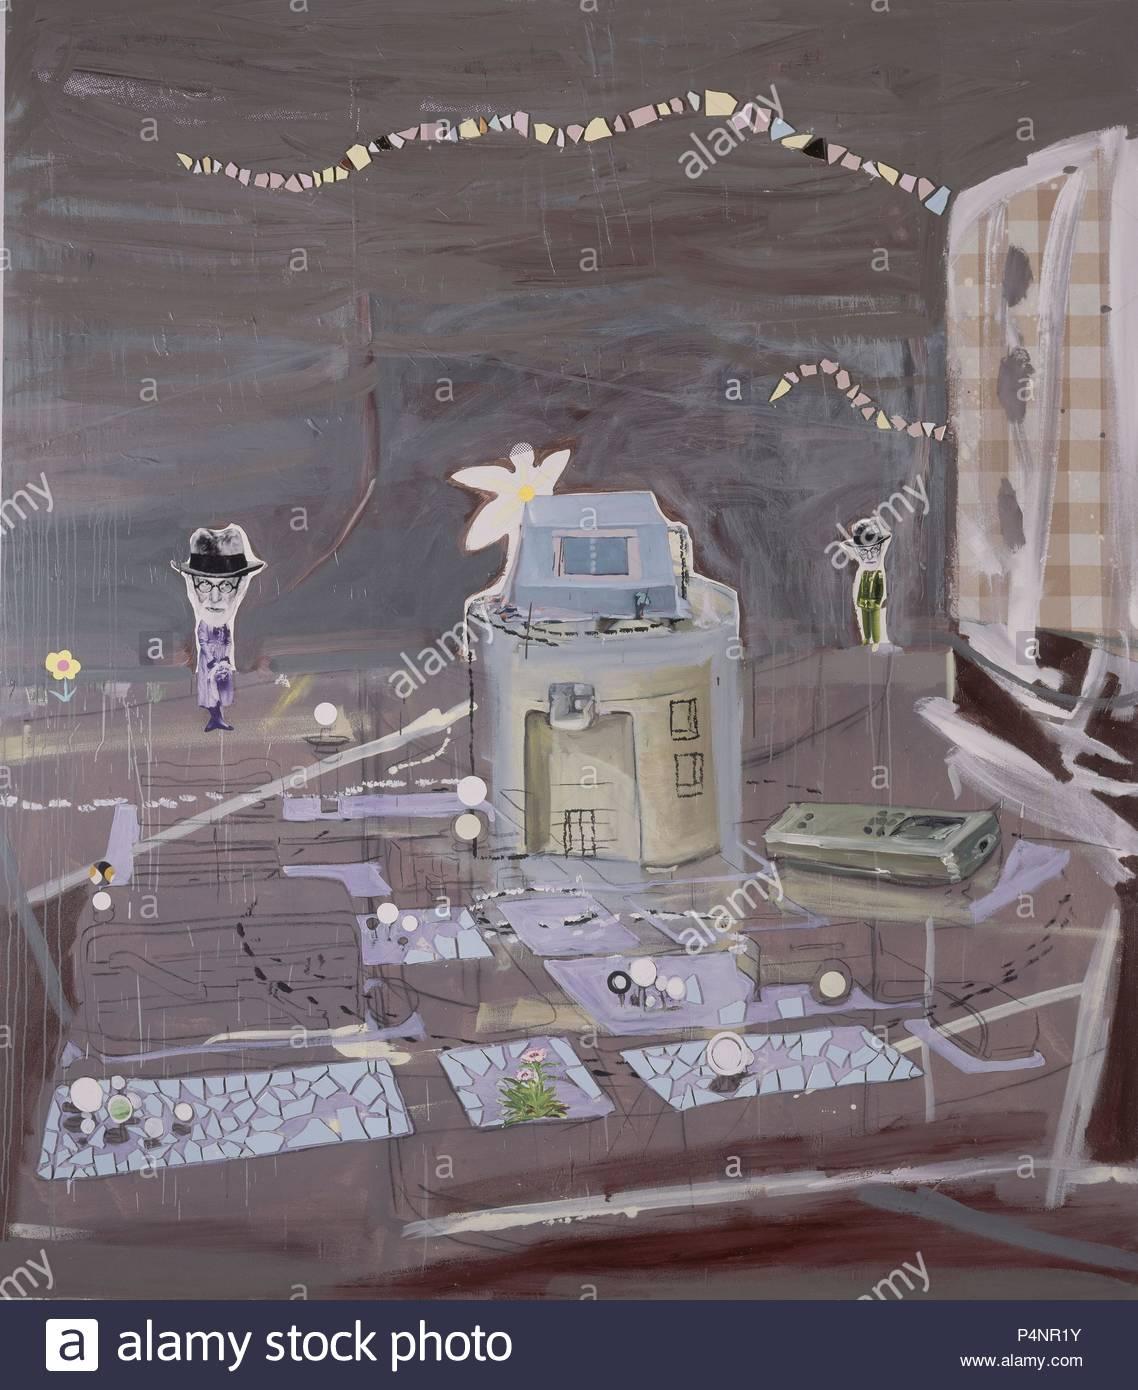 'Freud', 2008, Mixed media on canvas, 280 x 245 cm. Author: Juan Ugalde (b. 1958). Location: GALERIA SOLEDAD LORENZO, MADRID. - Stock Image